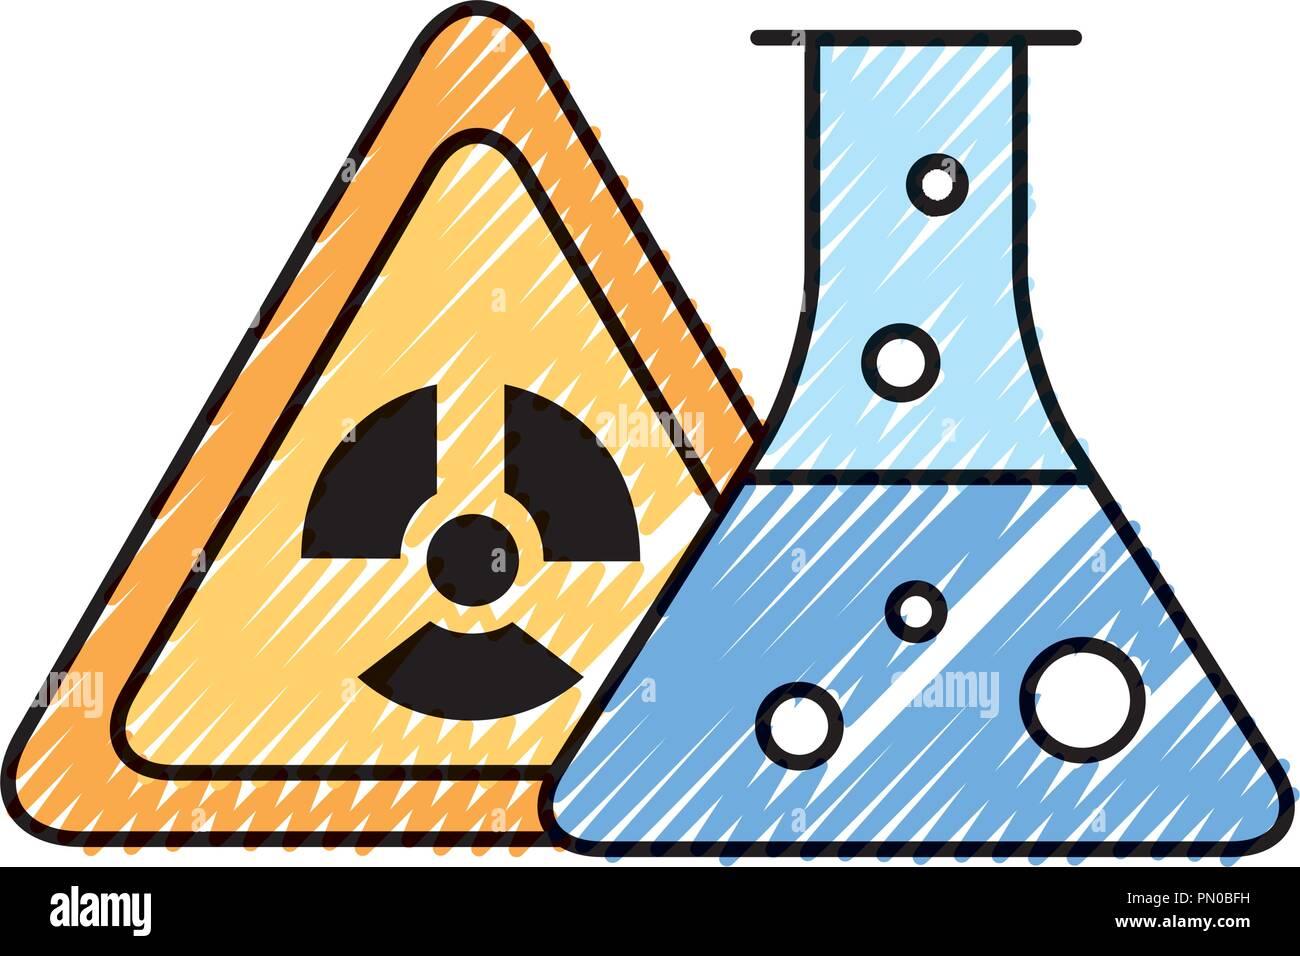 radiation hazard test tube chemistry - Stock Image